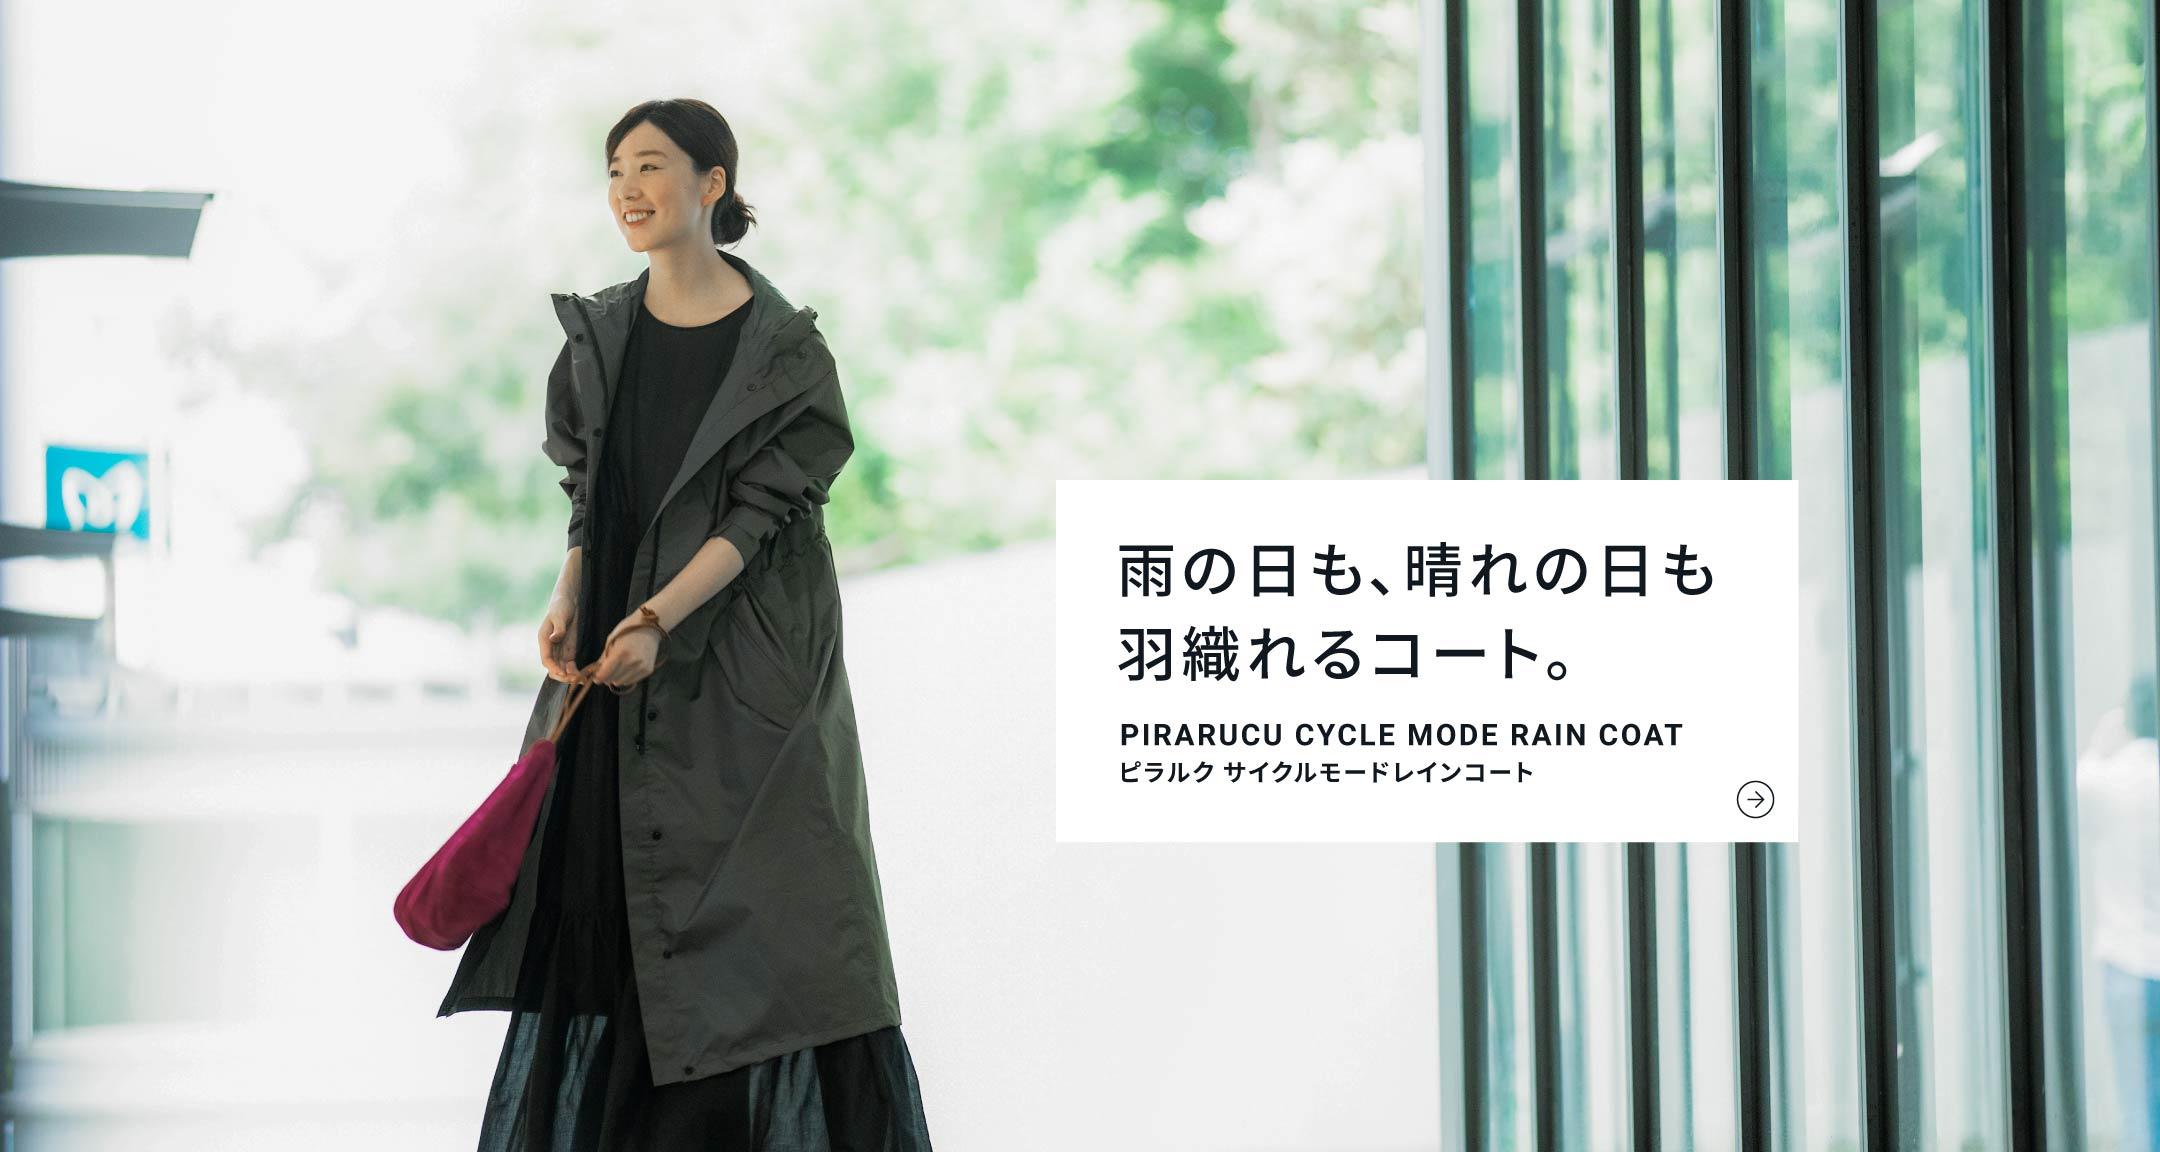 pirarucu-cycle-mode-rain-coat.jpg